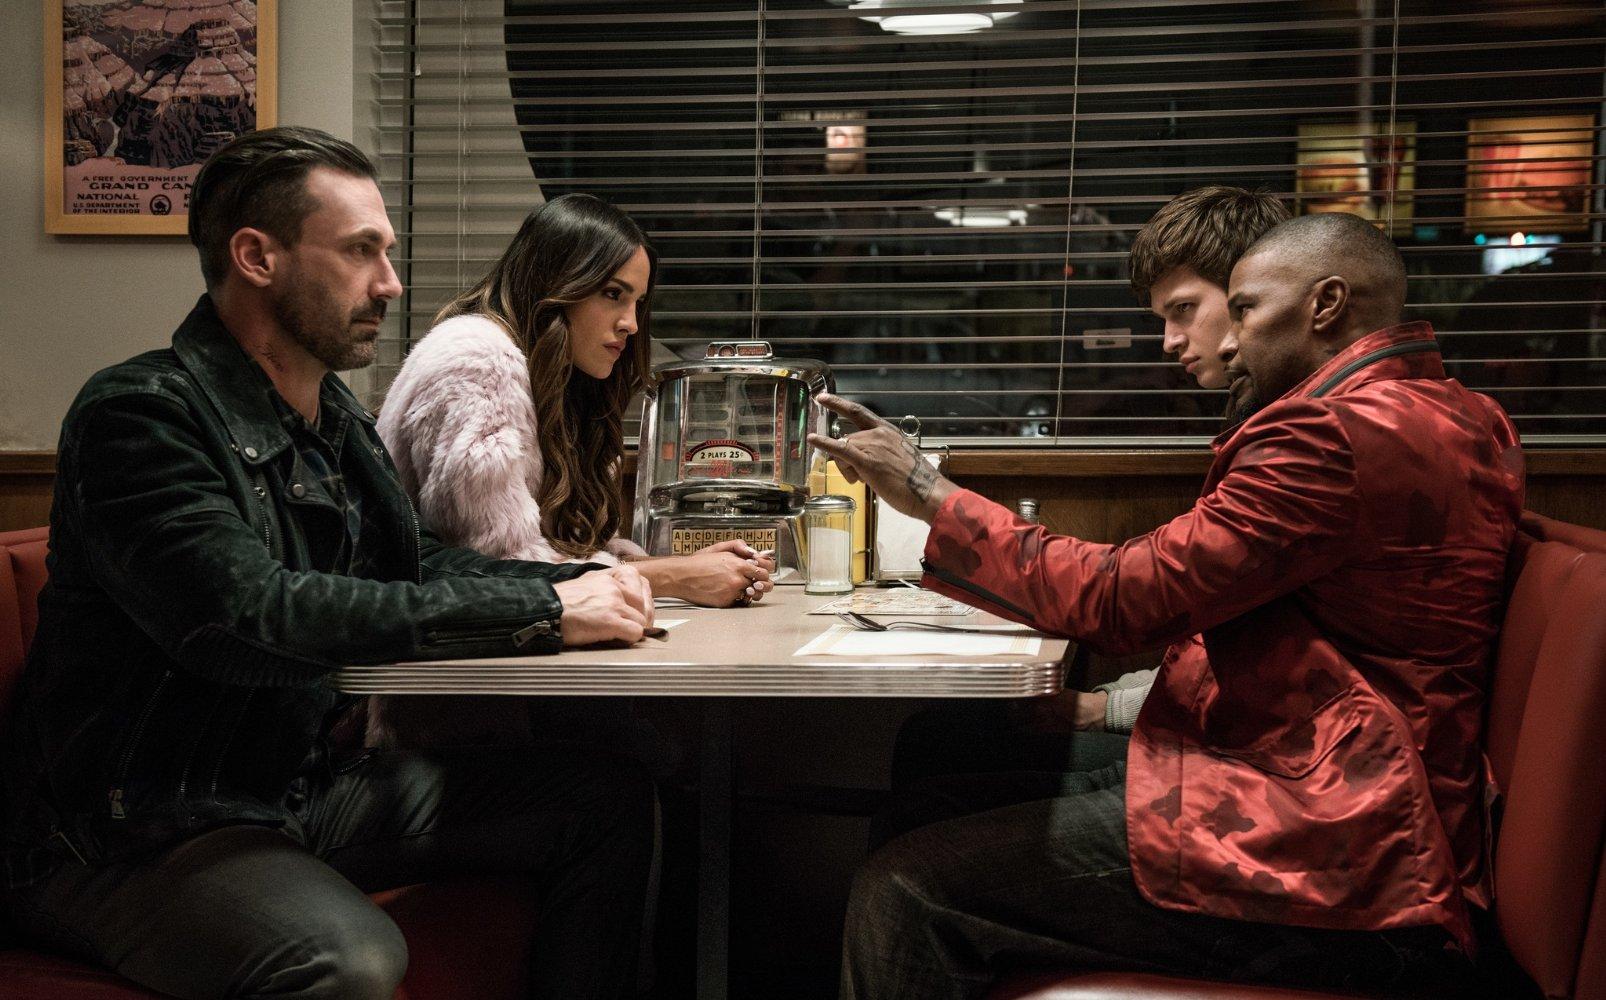 Jon Hamm, Eiza González, Ansel Elgort, and Jamie Foxx in BABY DRIVER (2017)